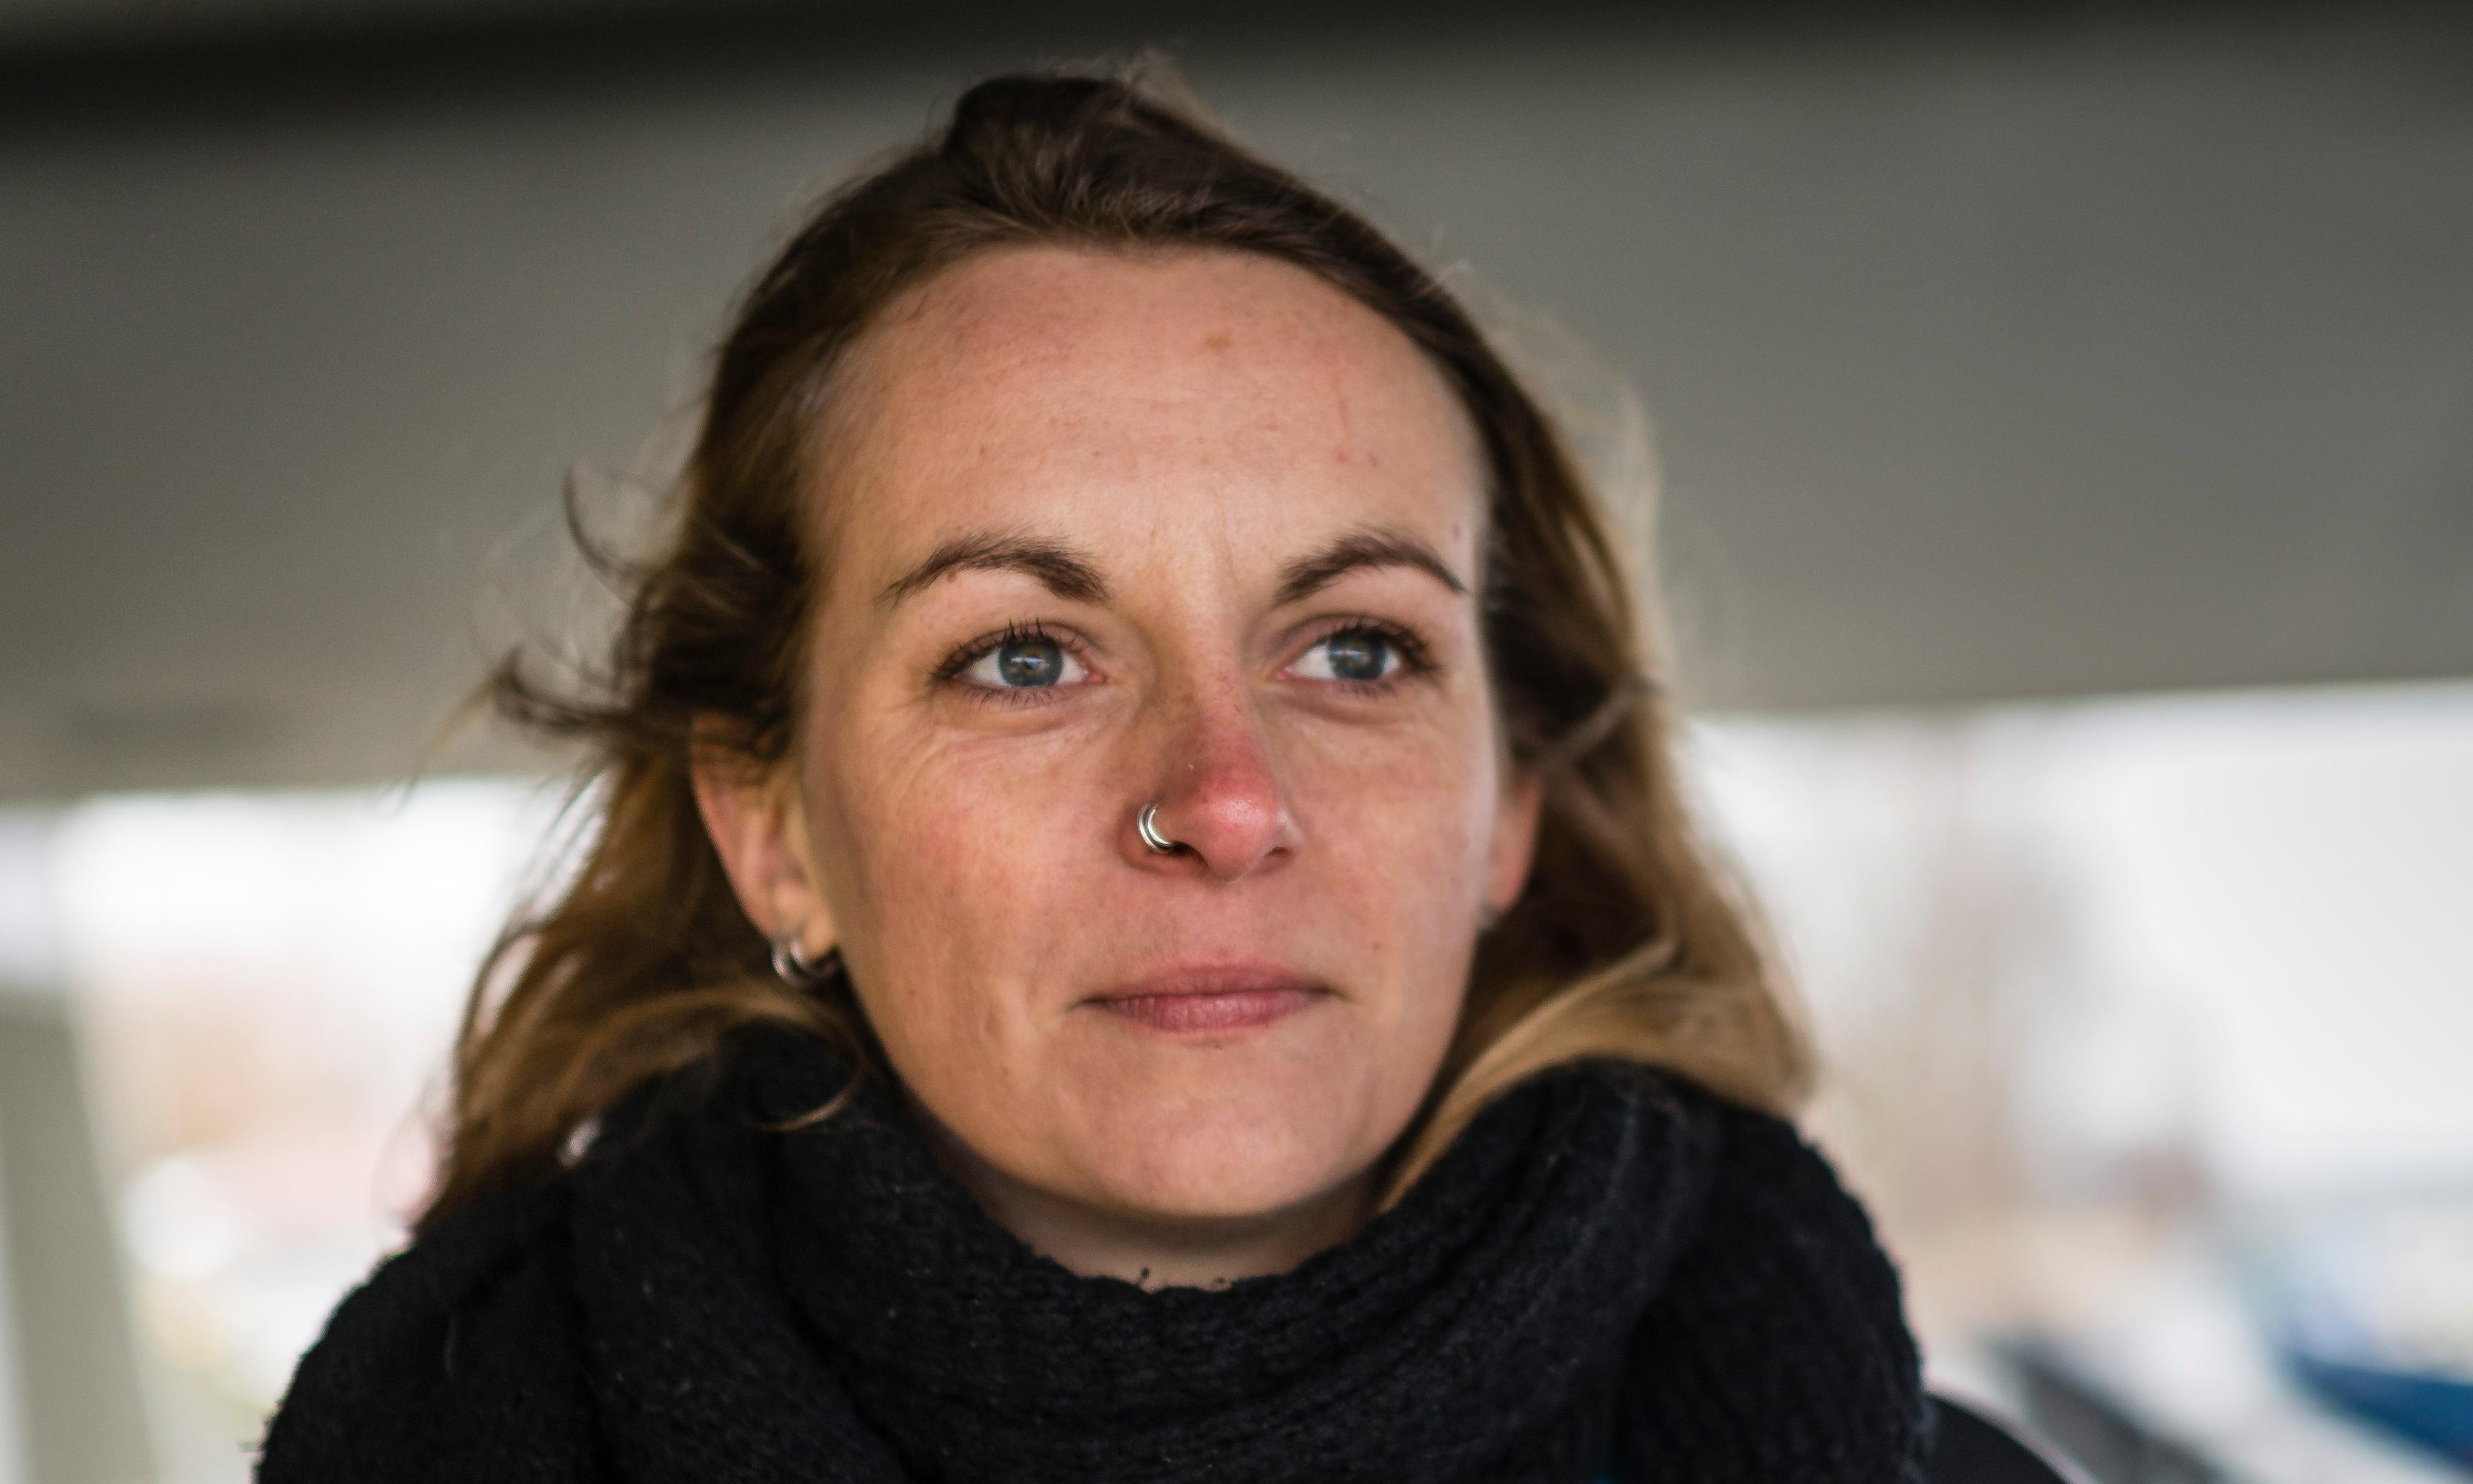 Captain of migrant rescue ship says Italy 'criminalising solidarity'